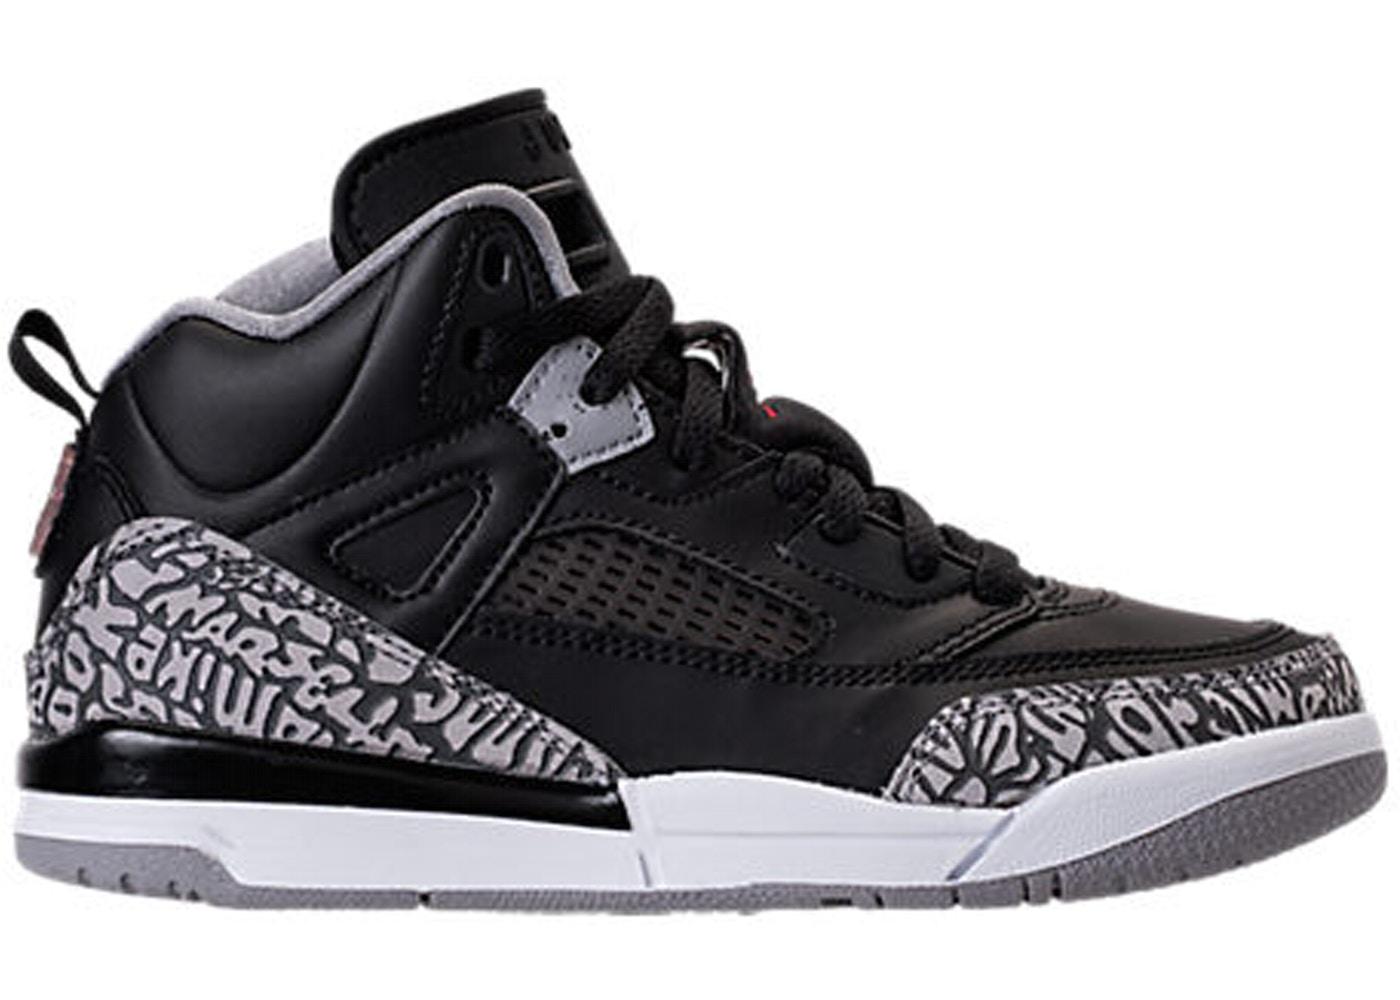 66a952ea09d0 Jordan Spizike Black Cement (PS) - 317700-034